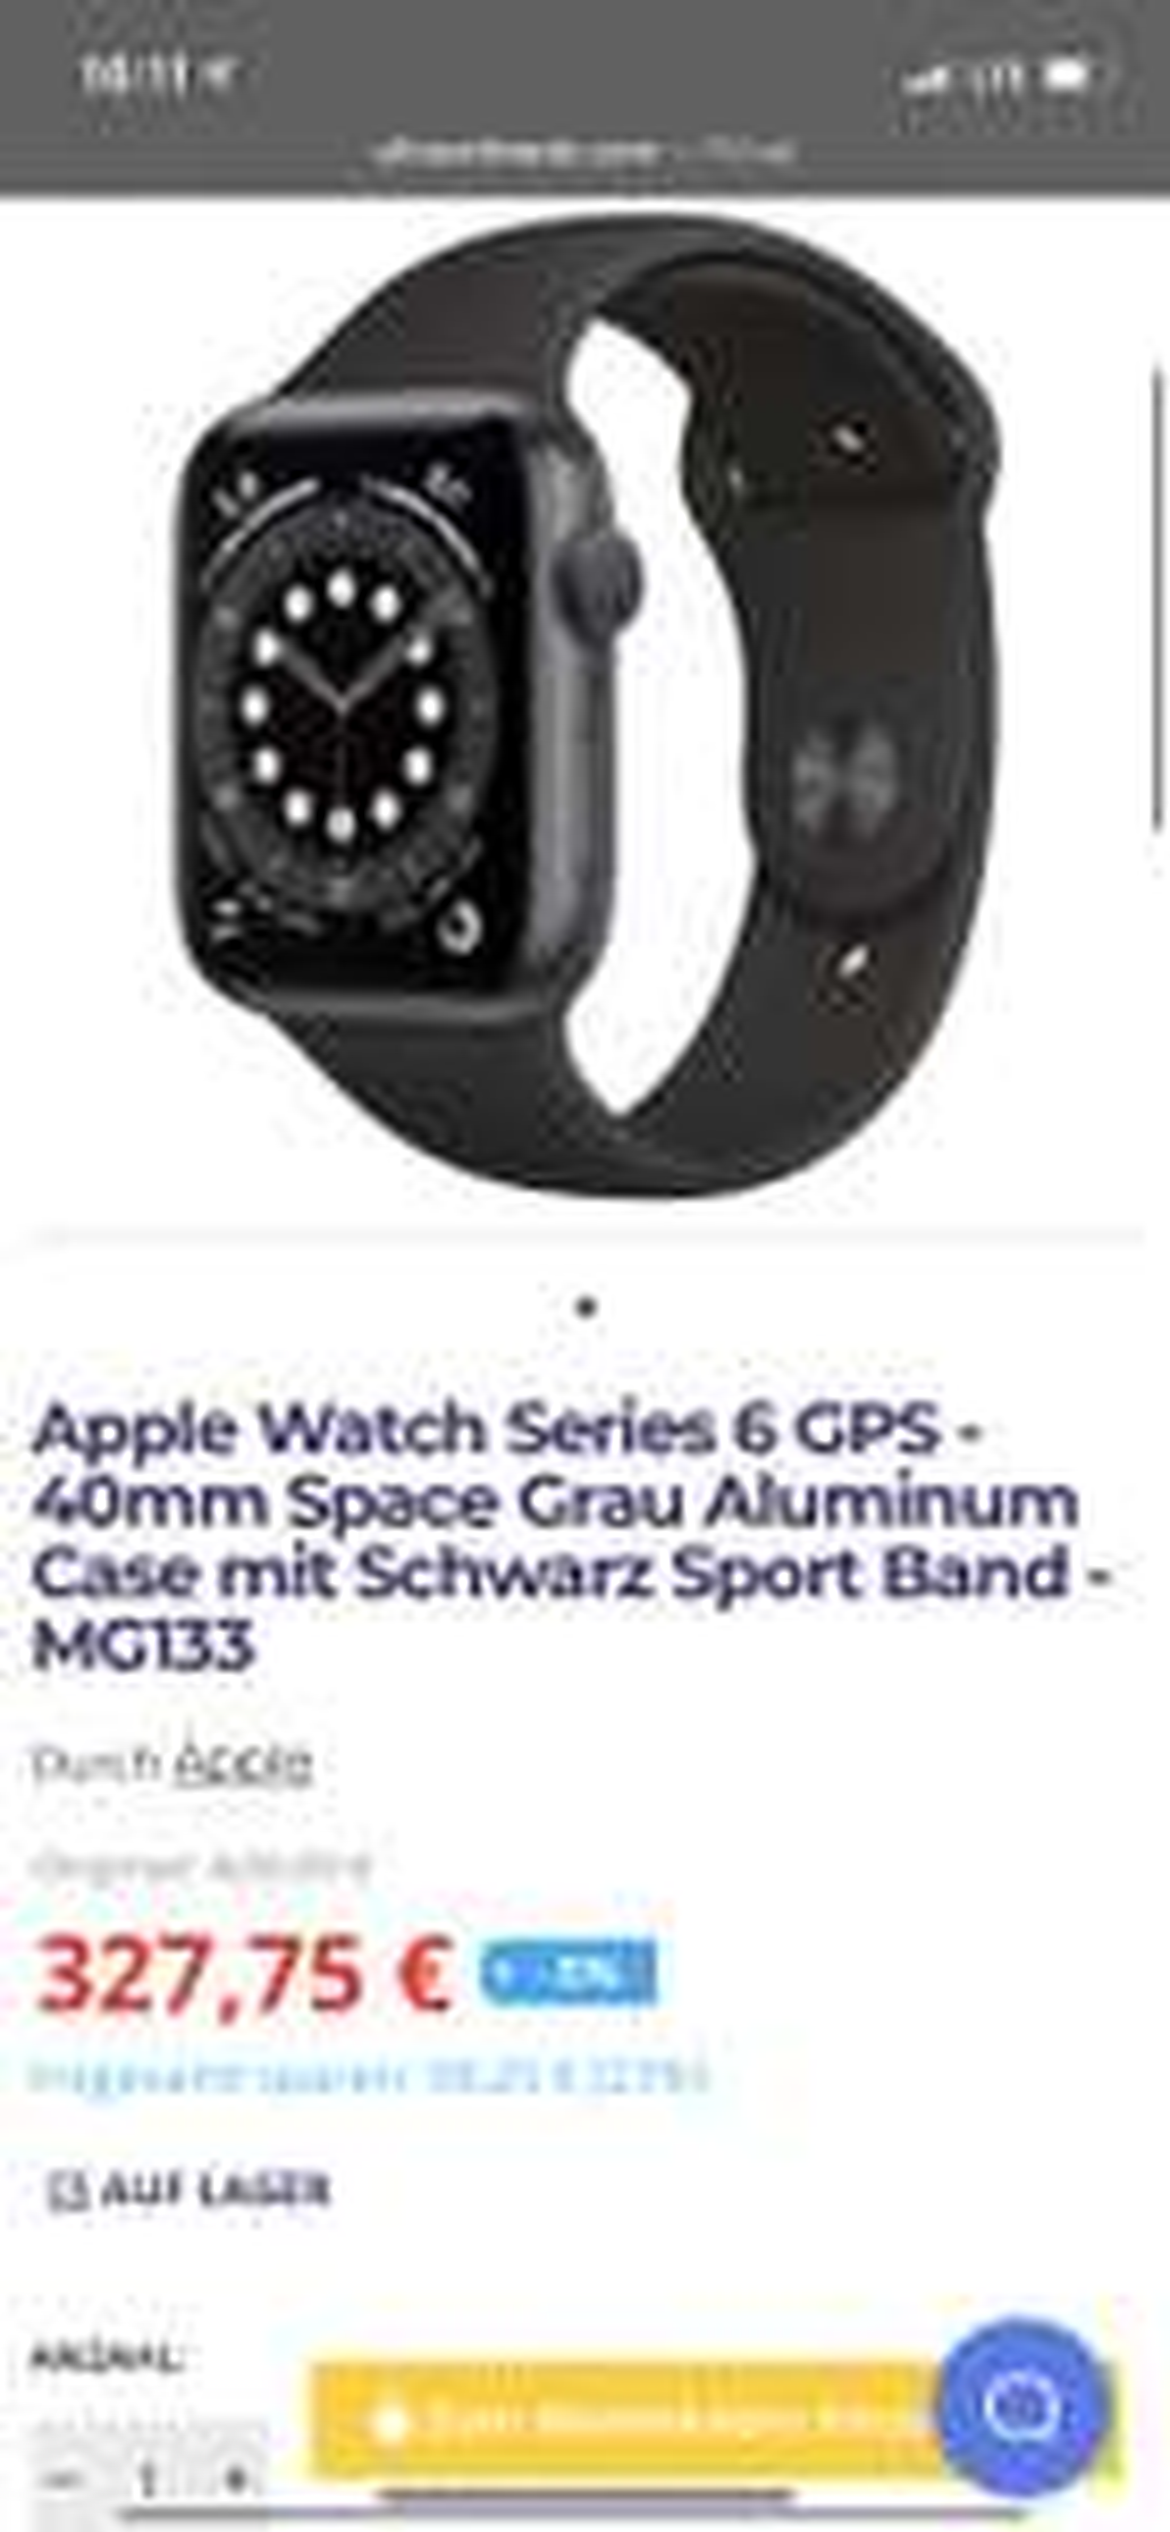 Apple Watch Series 6 GPS - 40mm Space Grau Aluminum Case mit Schwarz Sport Band - MG133